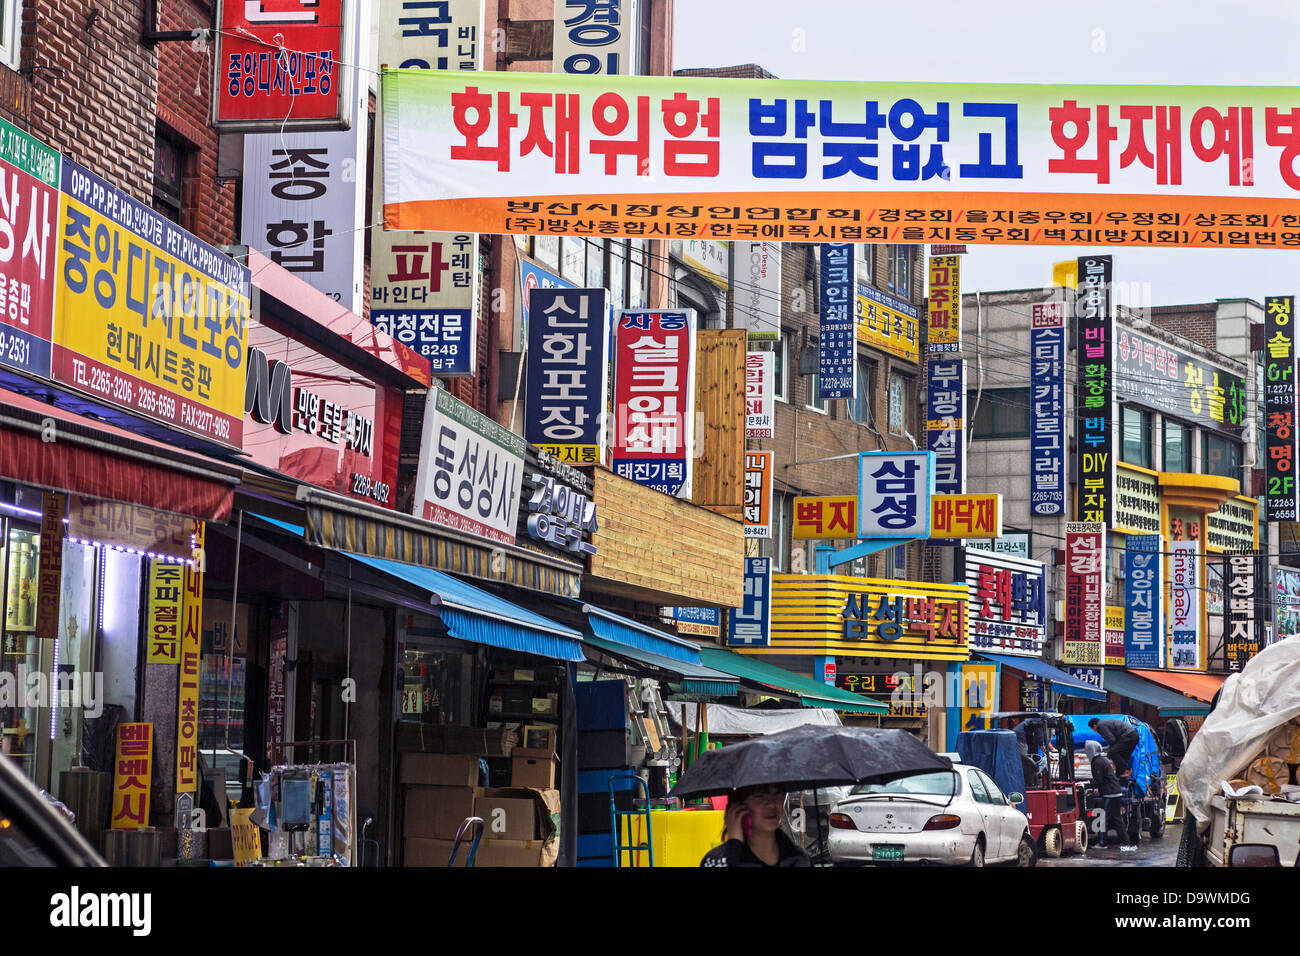 Street scene in Dongdaemun market, Seoul, South Korea, Asia - Stock Image